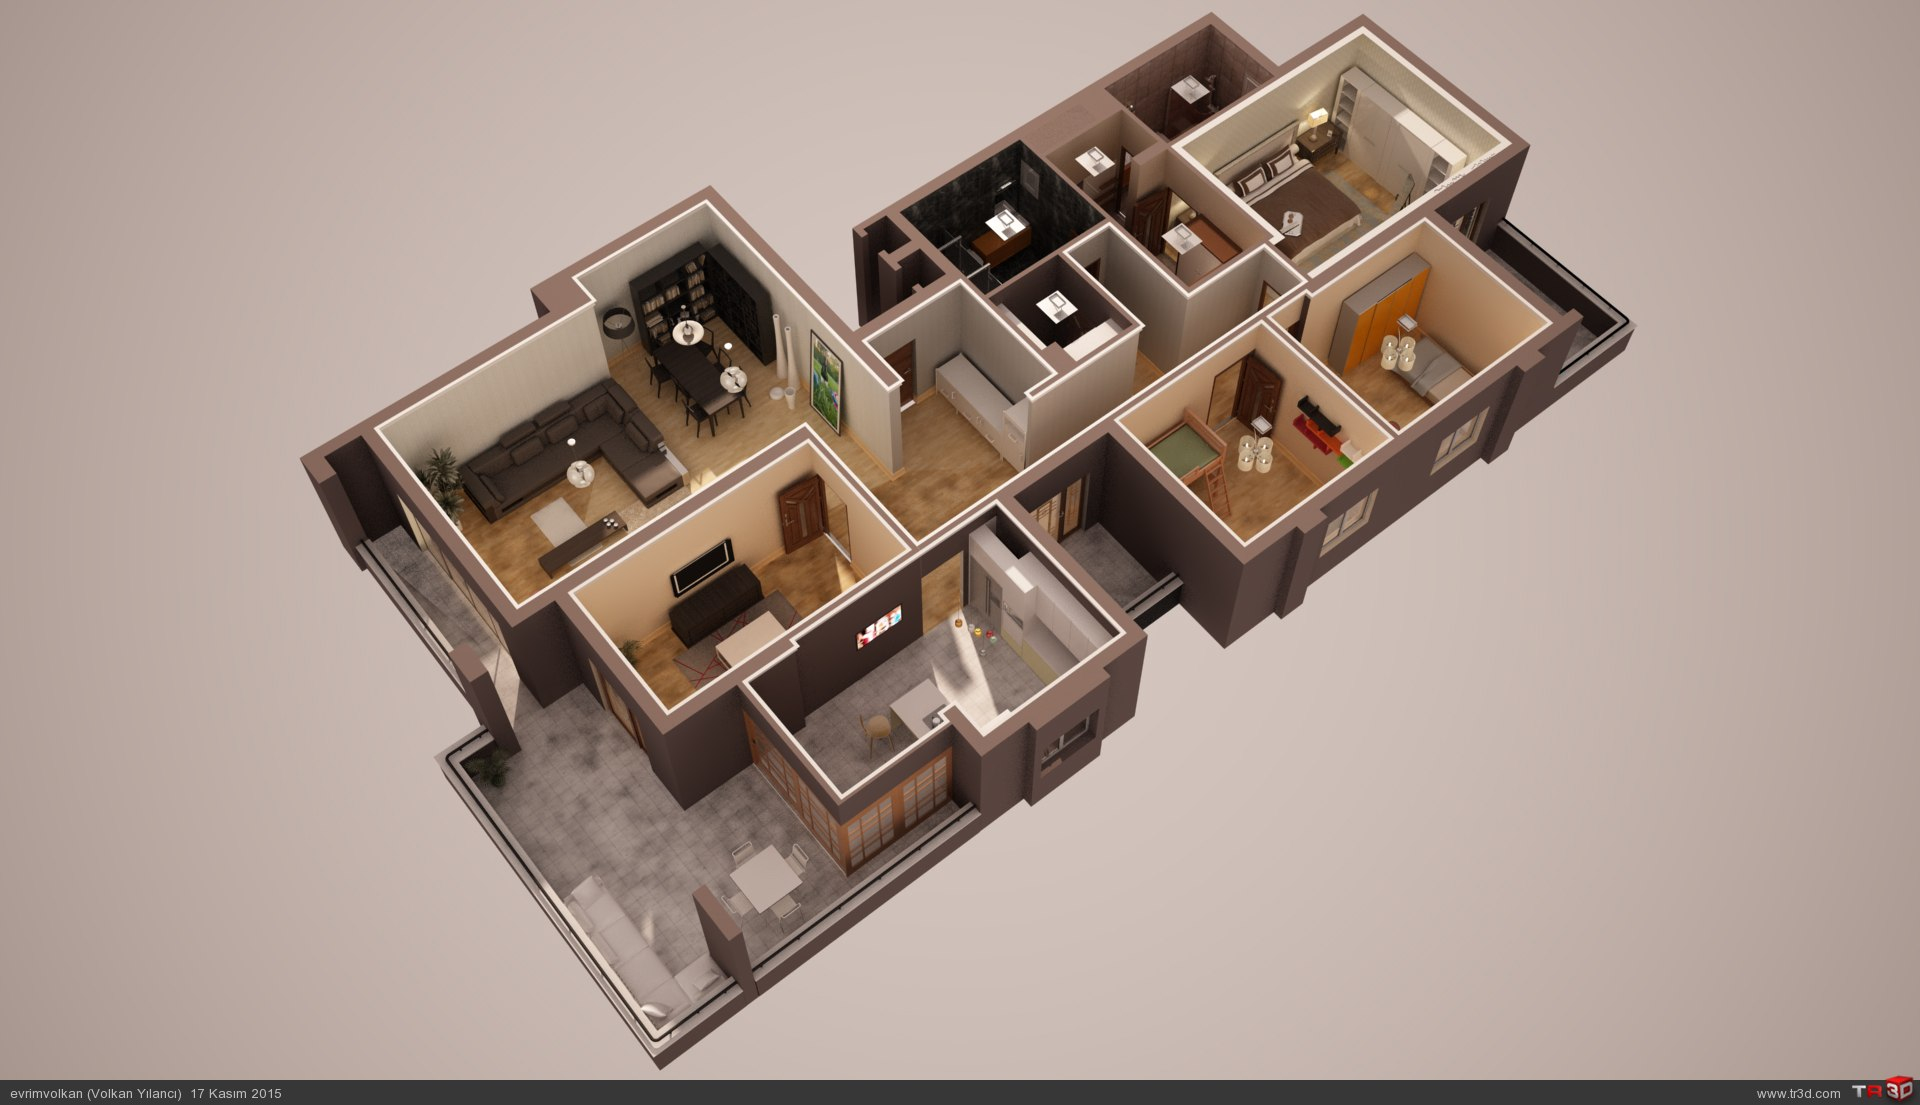 Örnek daire